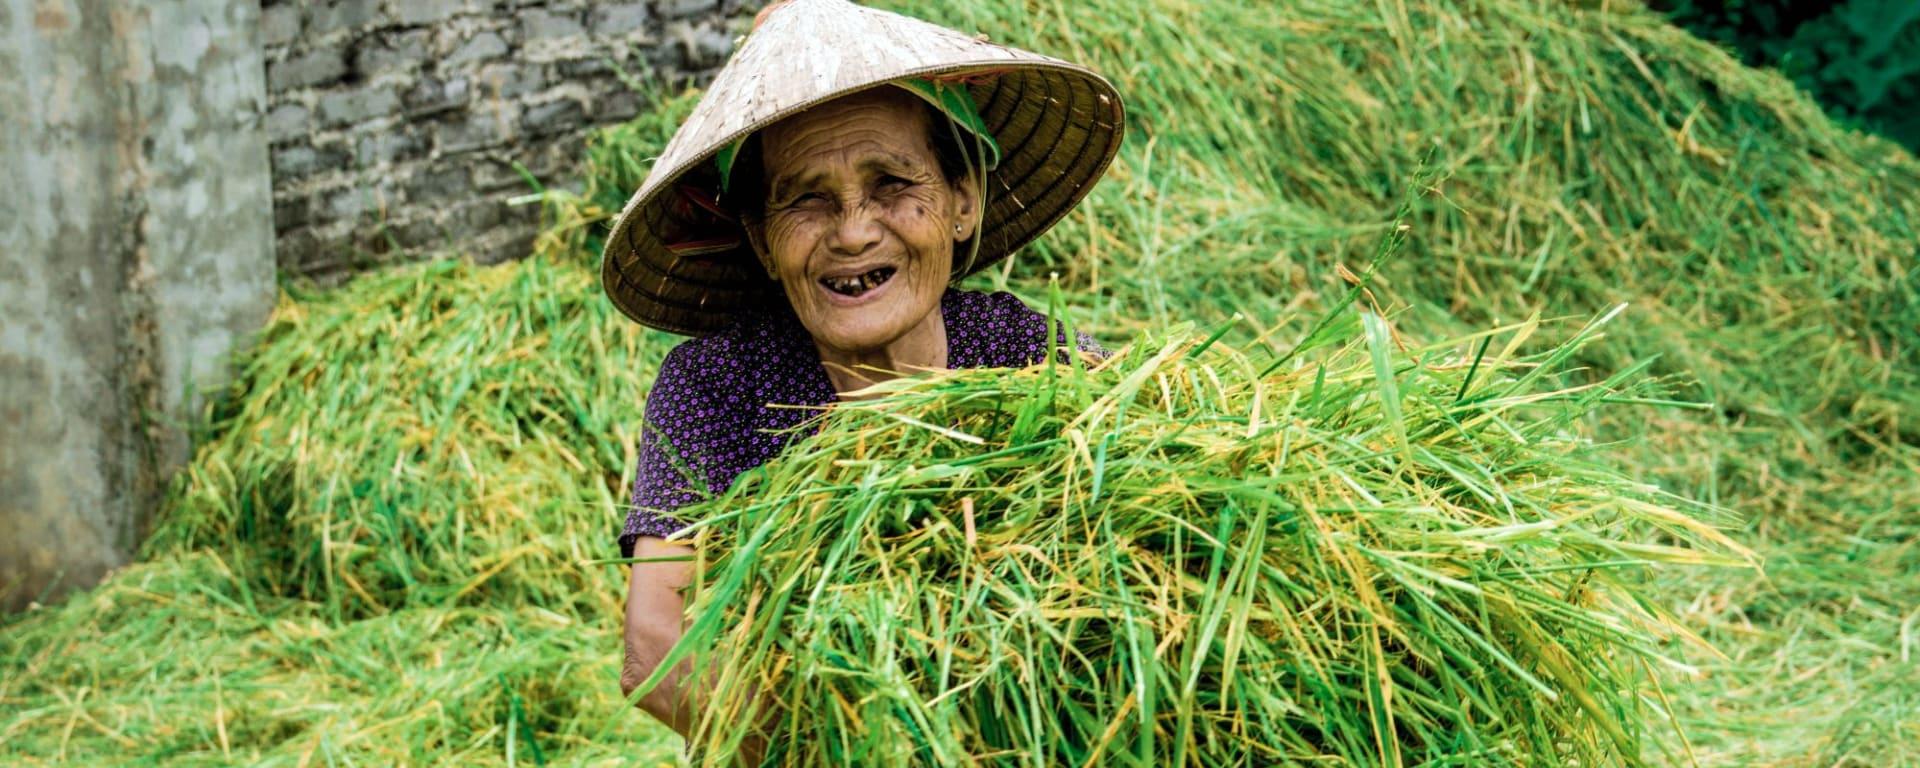 Impressionen Nordvietnams ab Hanoi: Ninh Binh